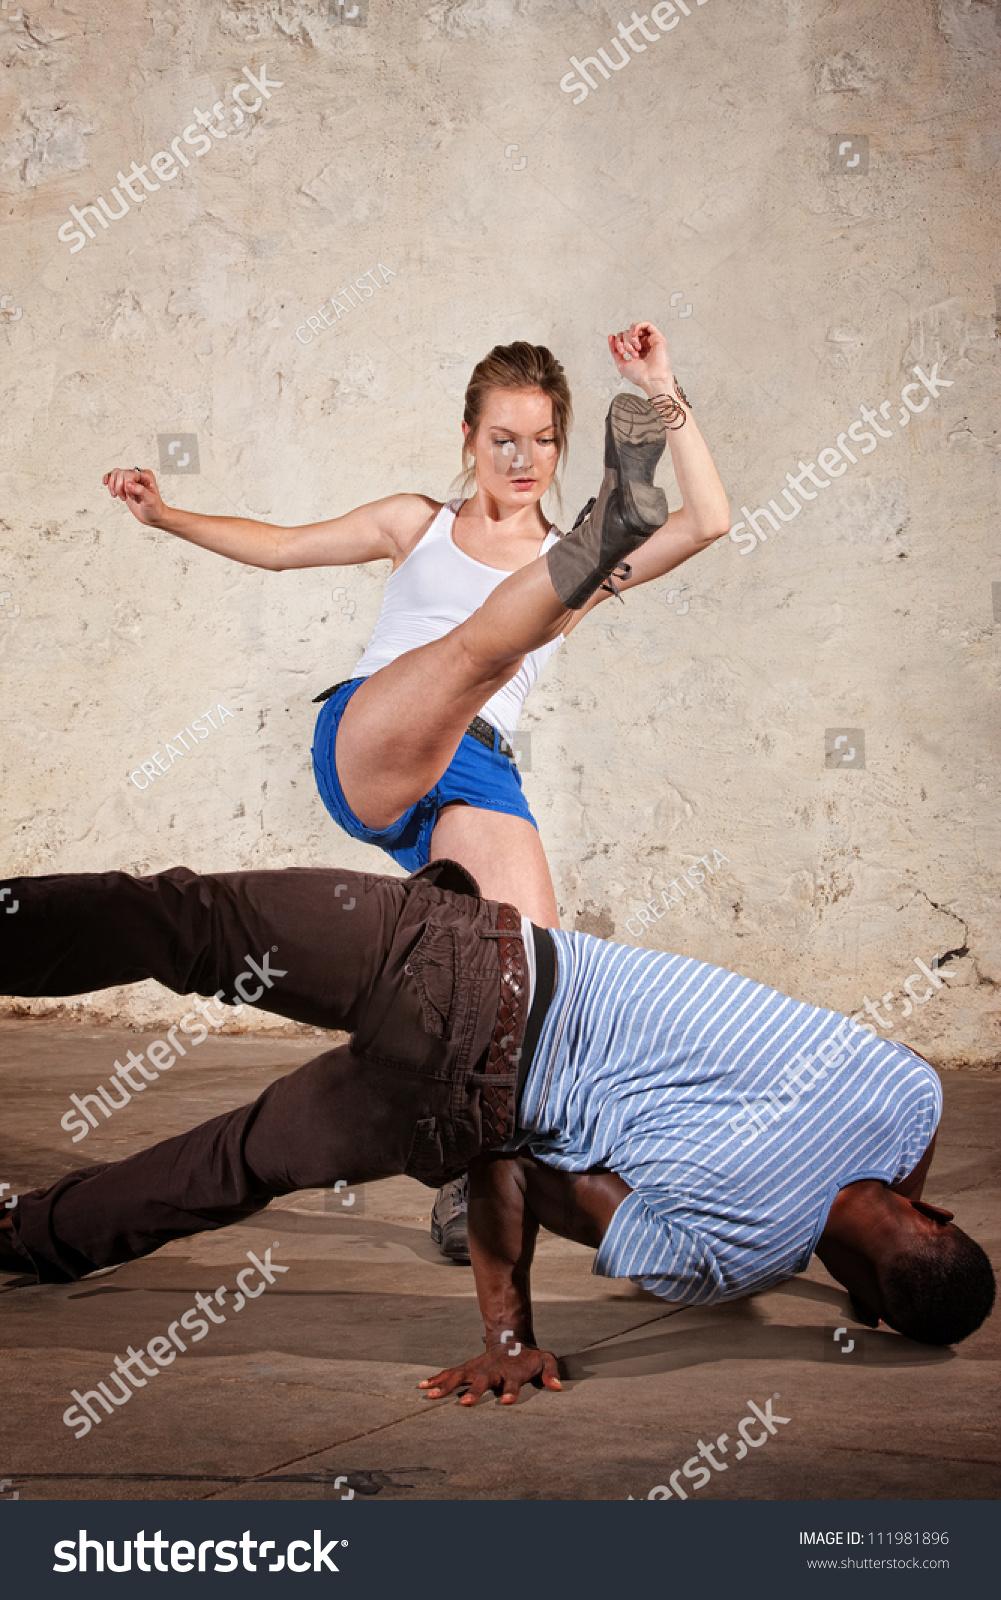 domination Female karate